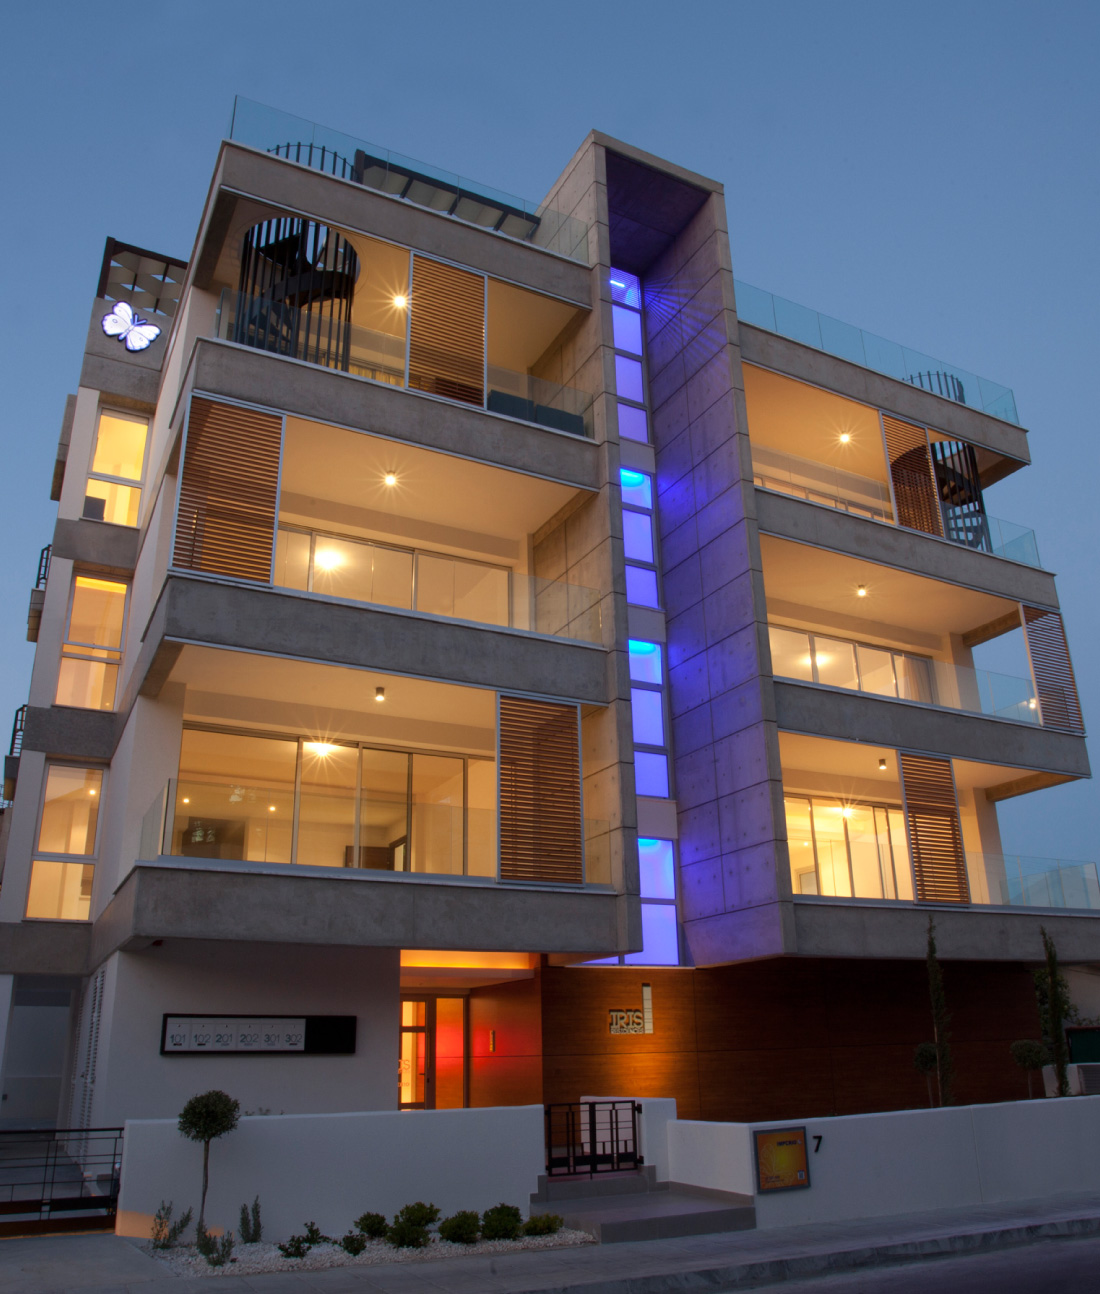 iris, irisresidences, imperioproperties, limassol, cyprus, cyprusproperties, limassolresidences, apartments, limassolarea, properties, property, residences